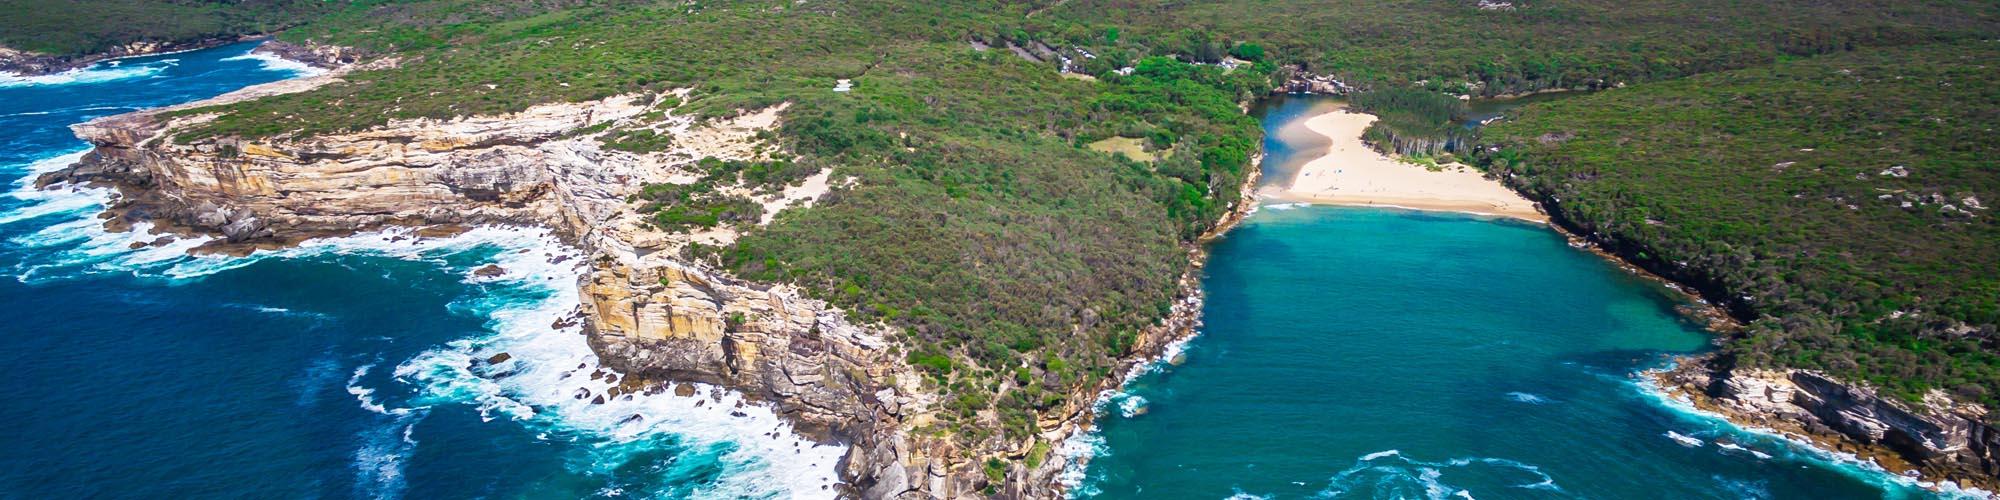 Self Guided walk Coast Track Royal National Park Sydney